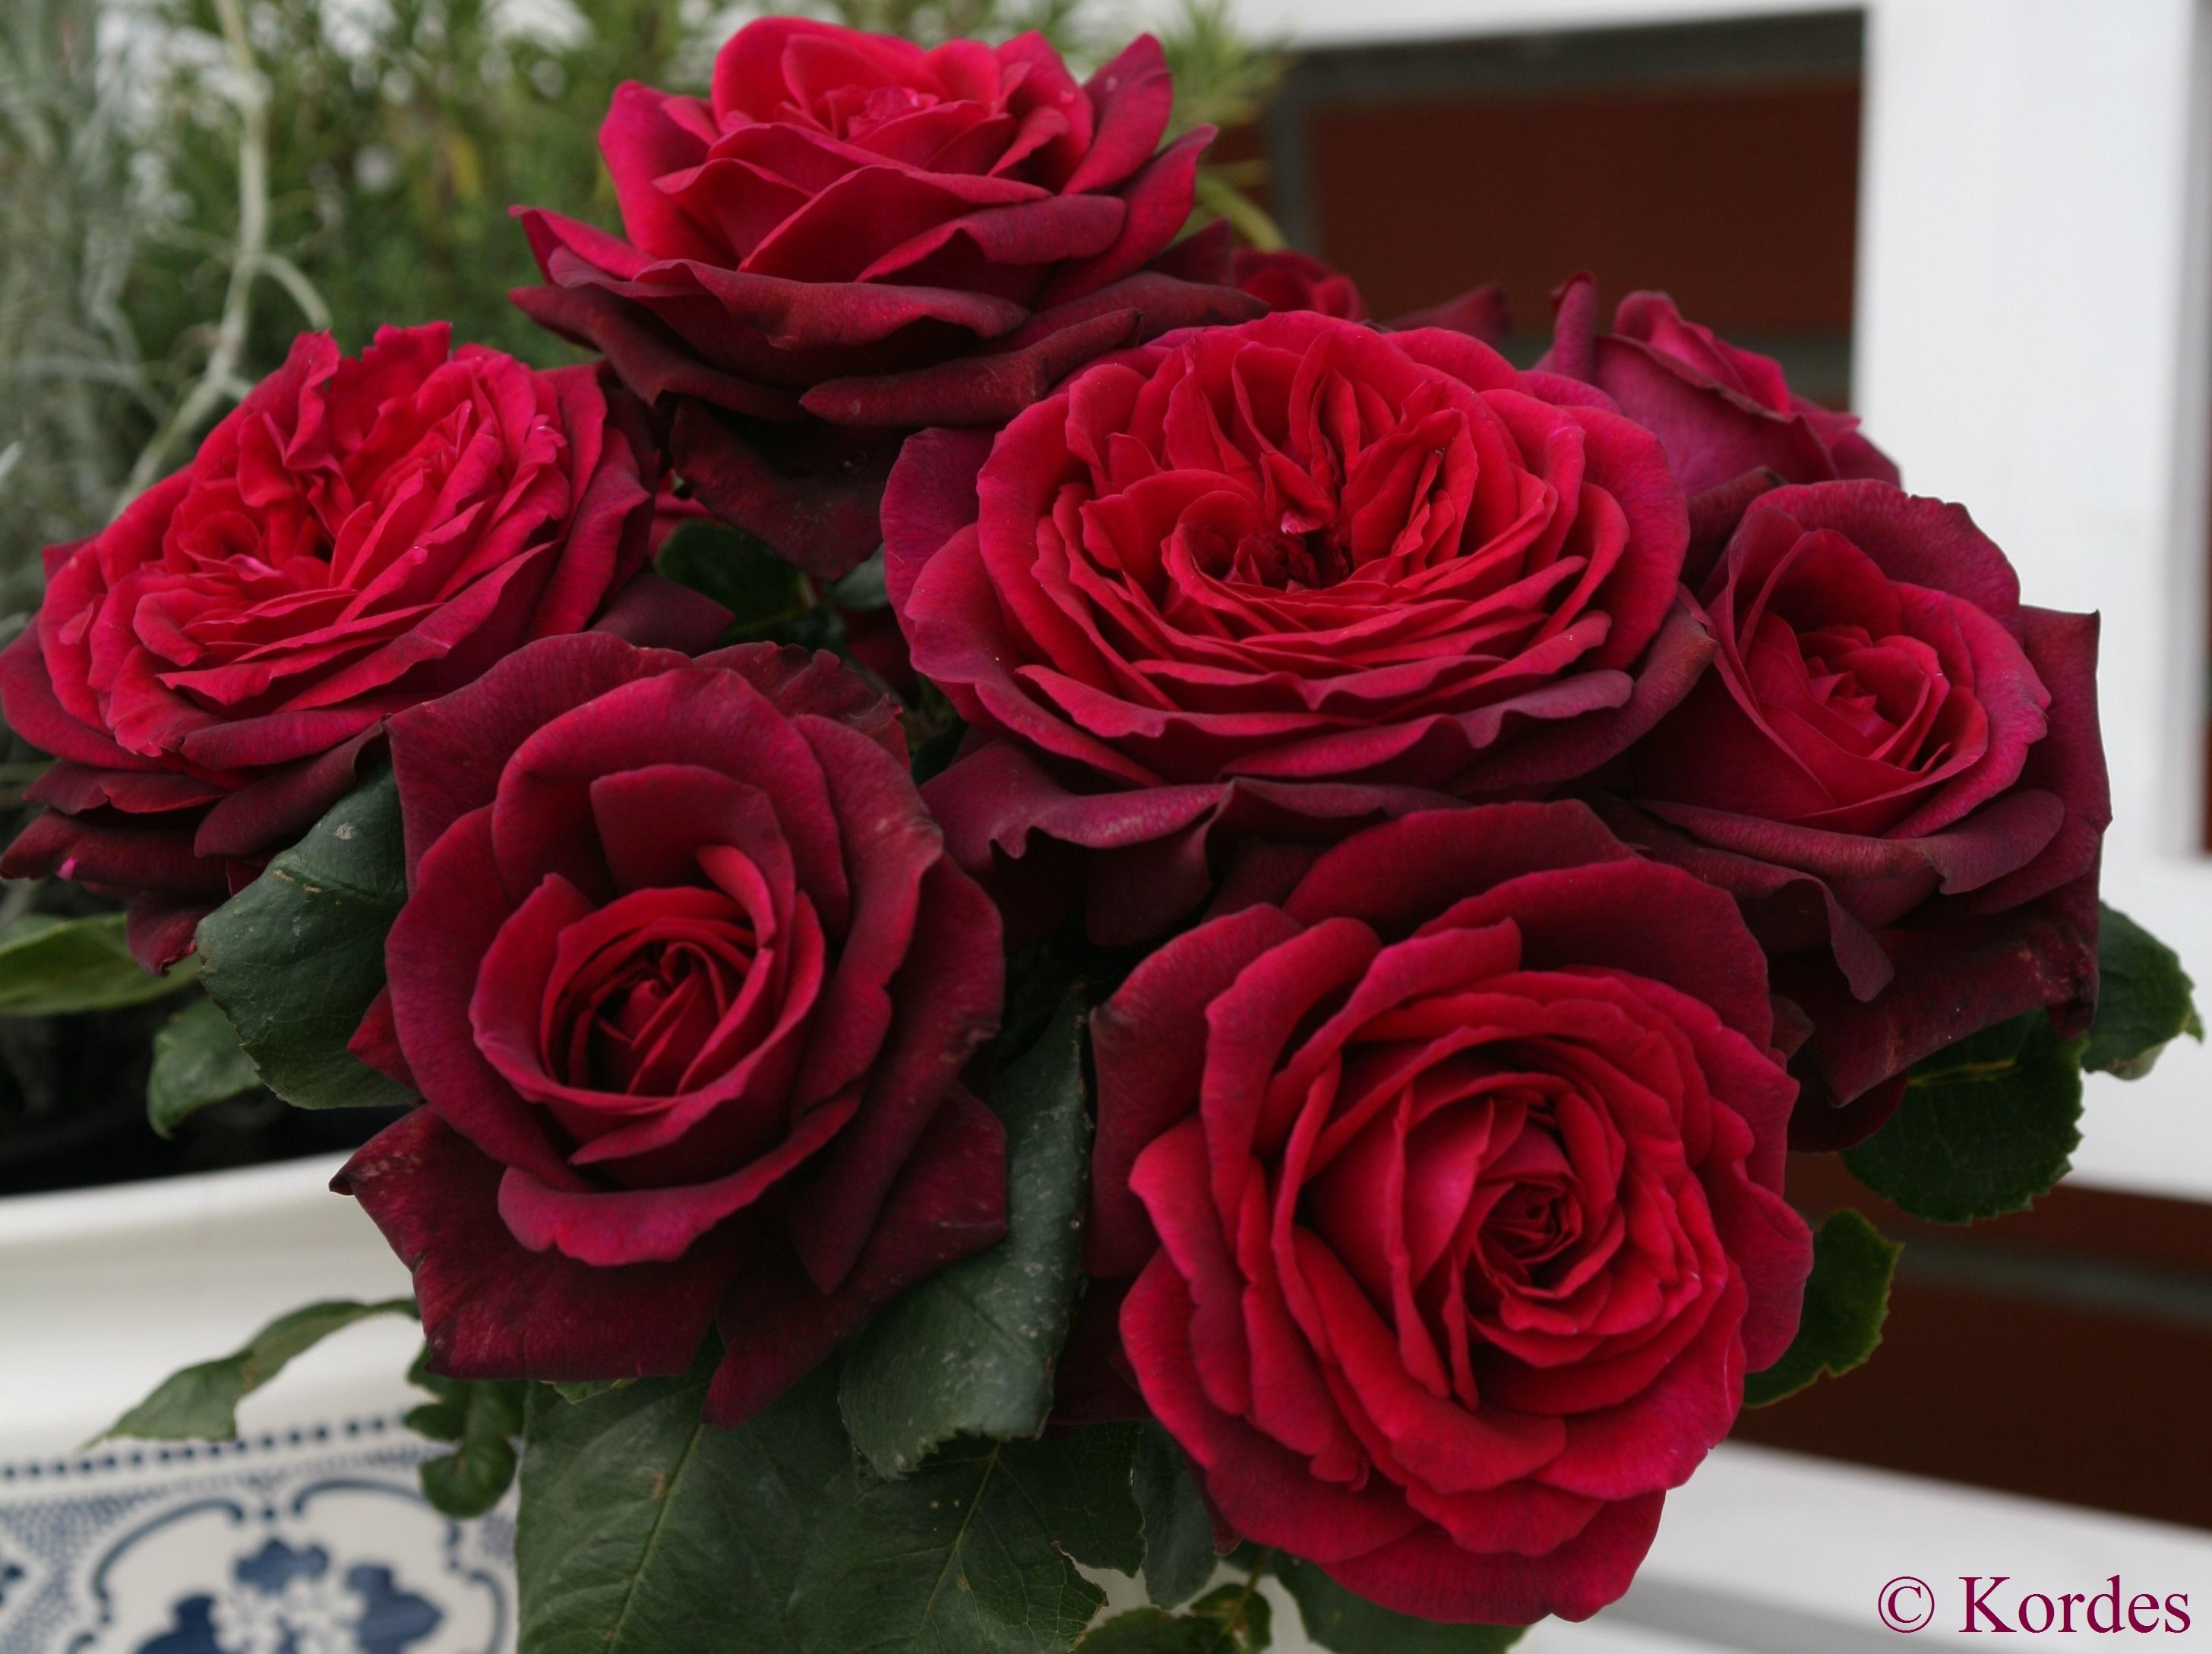 HQ Rose Wallpapers | File 1004.8Kb